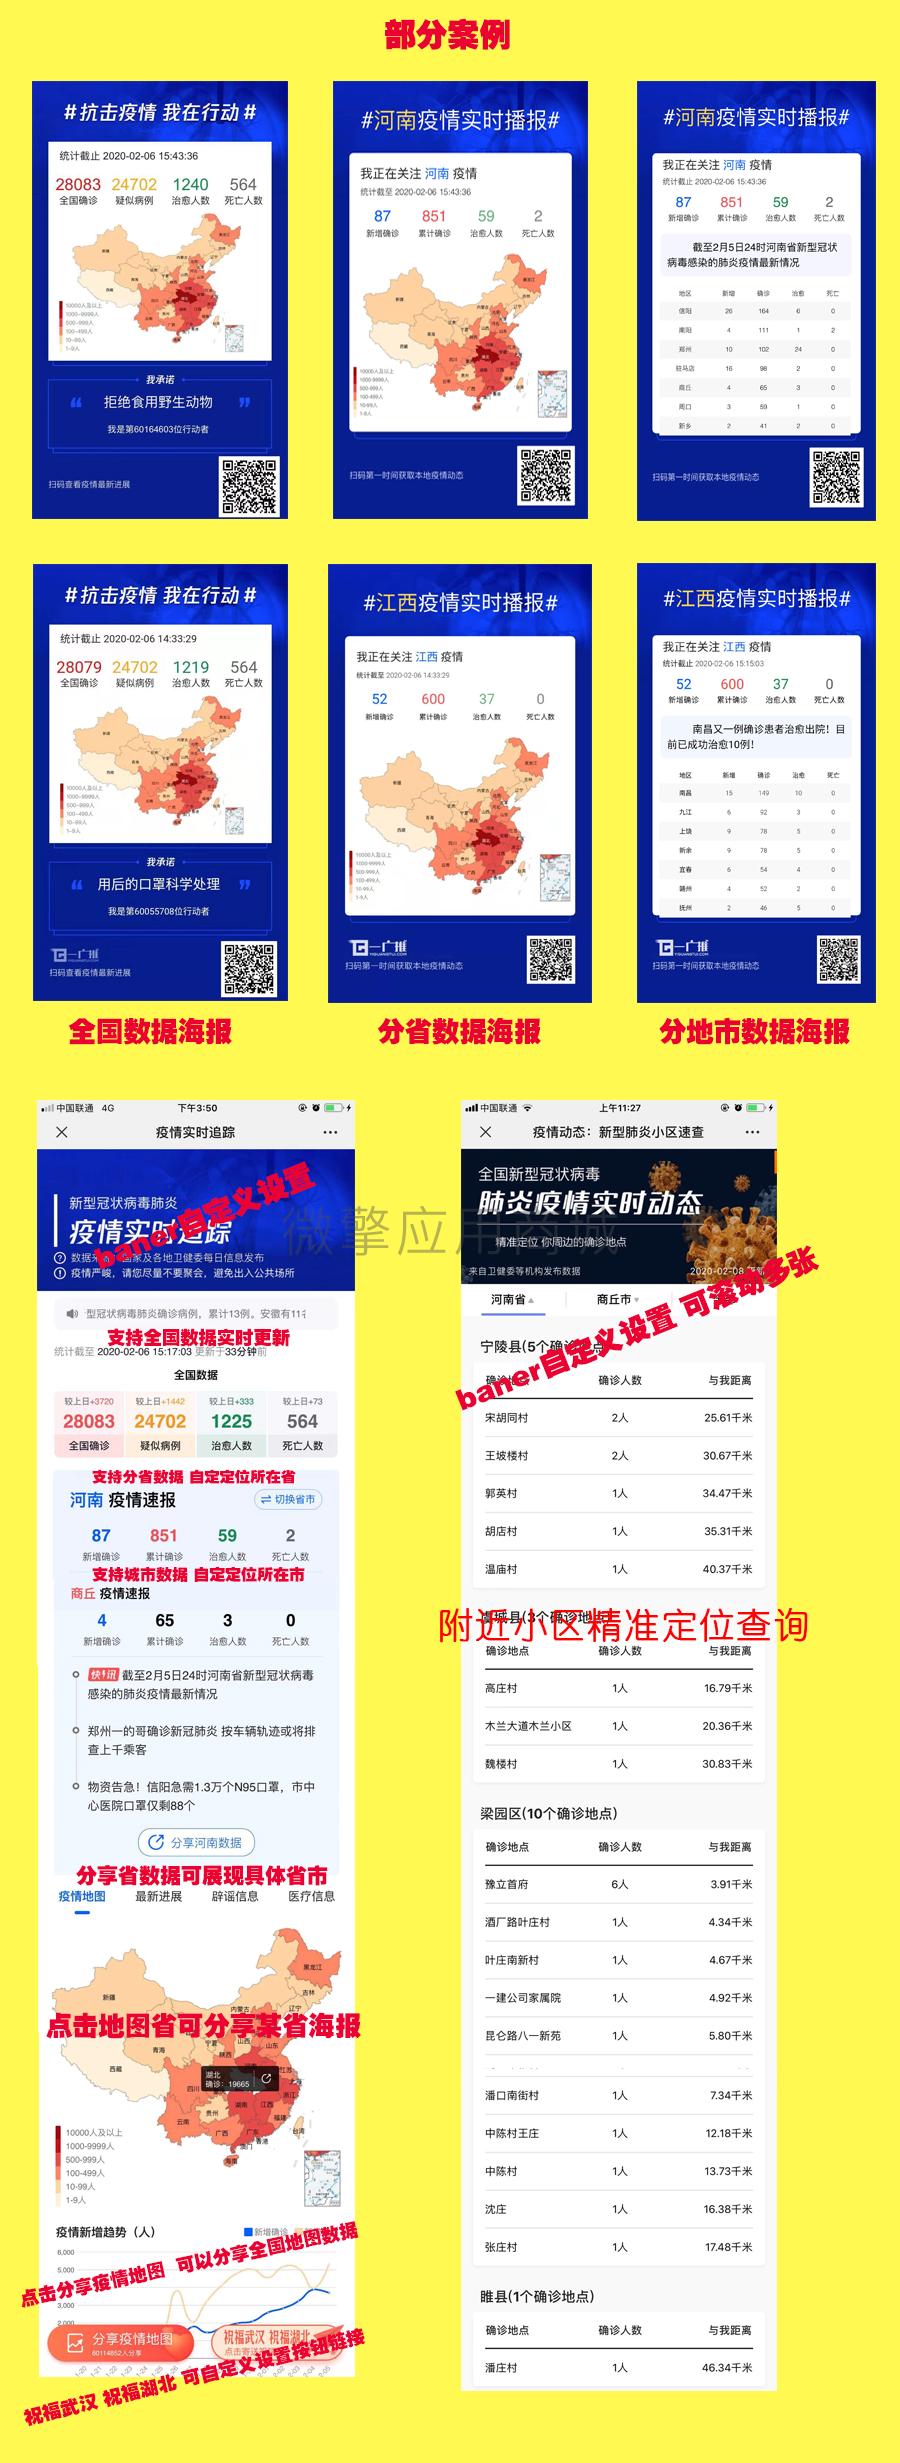 wq模块武汉肺炎疫情实时数据1.0.3 公众号模块 第2张